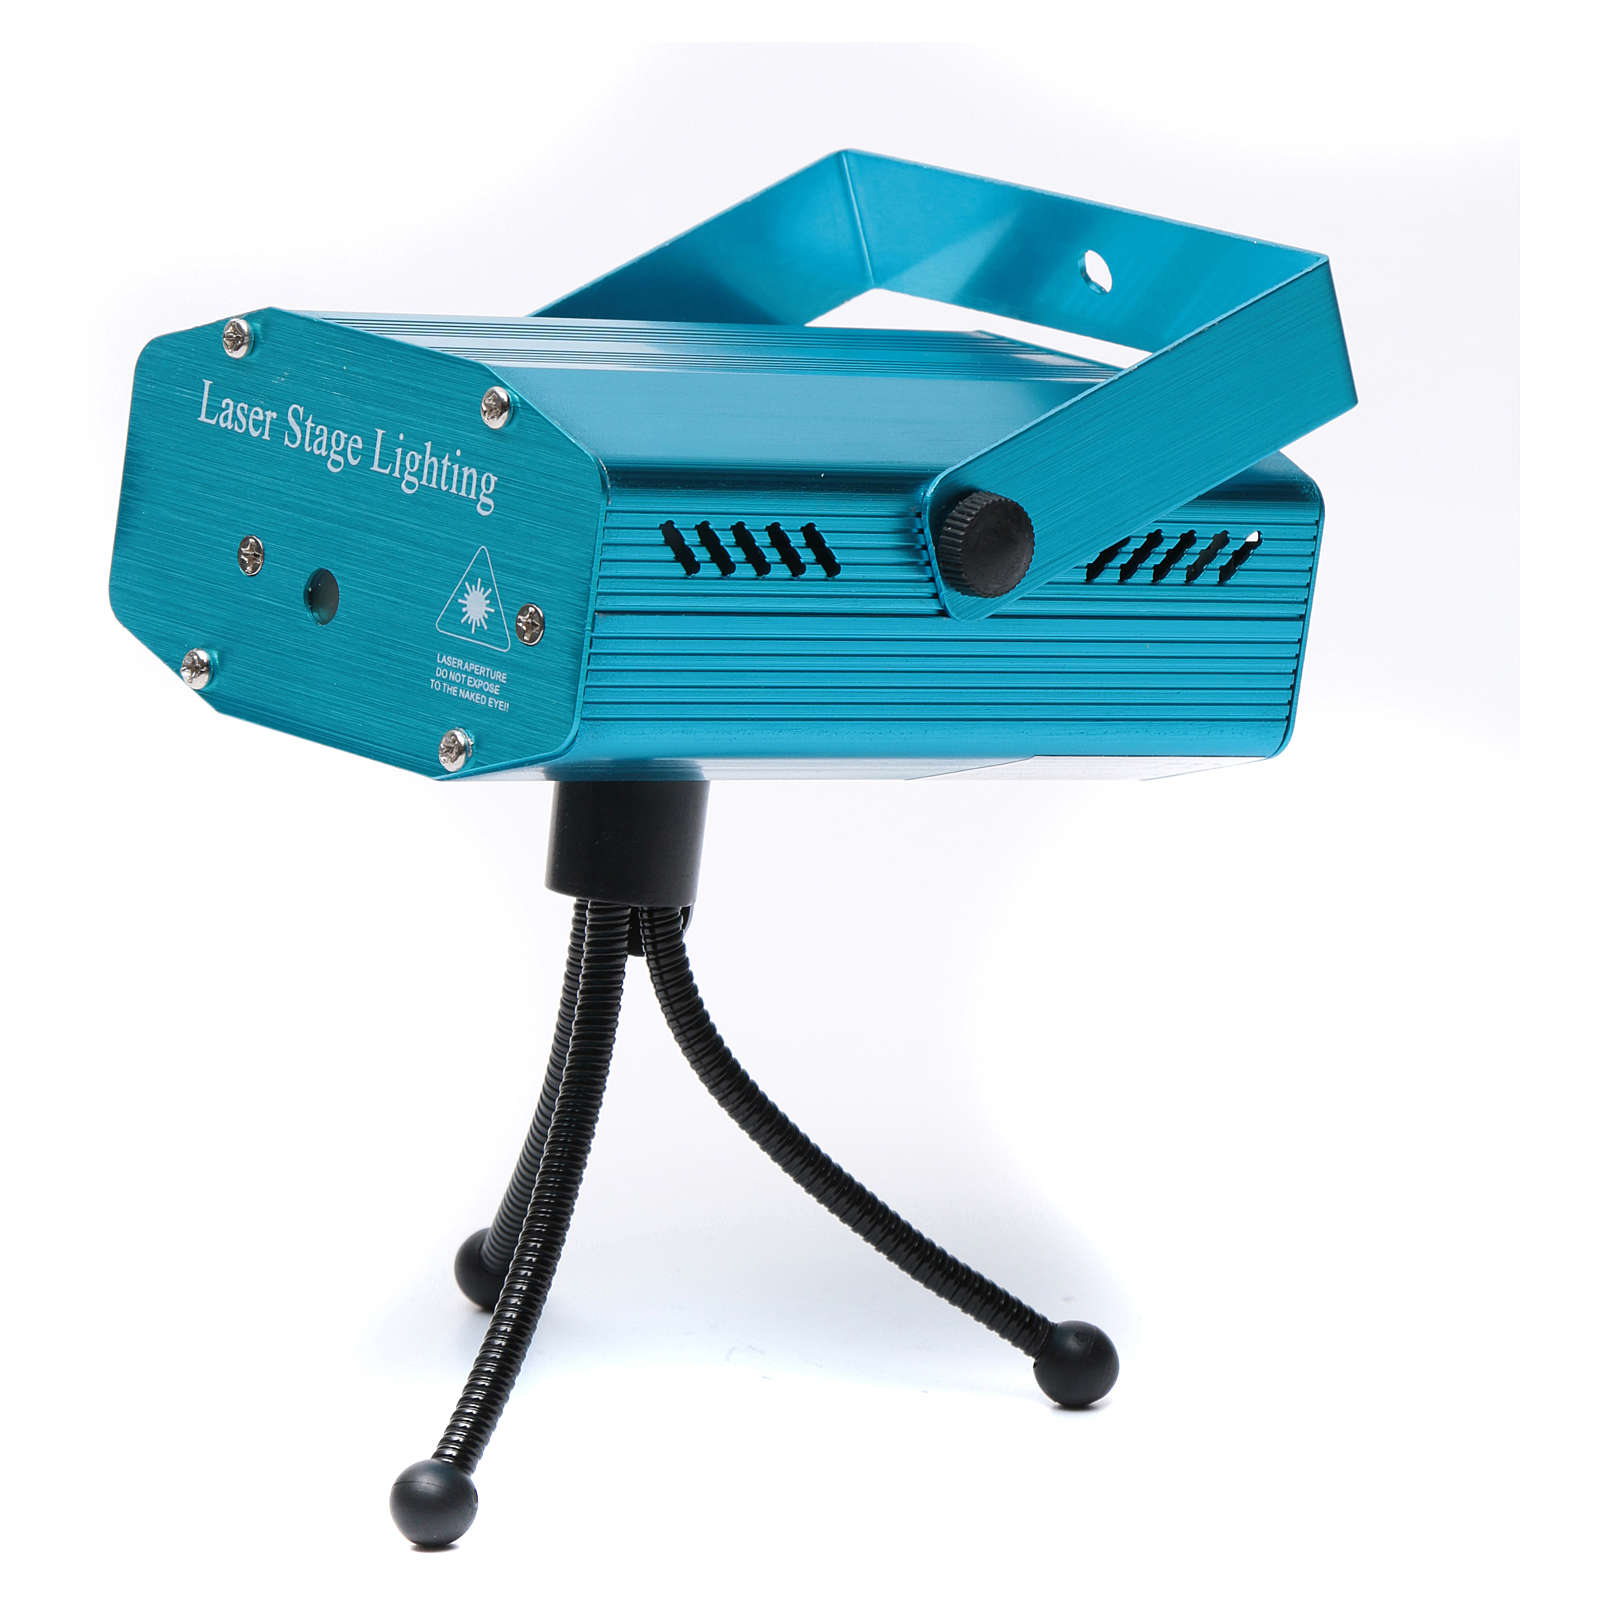 Proiettore laser Immagini Natalizie per interni punti verde rosso 3